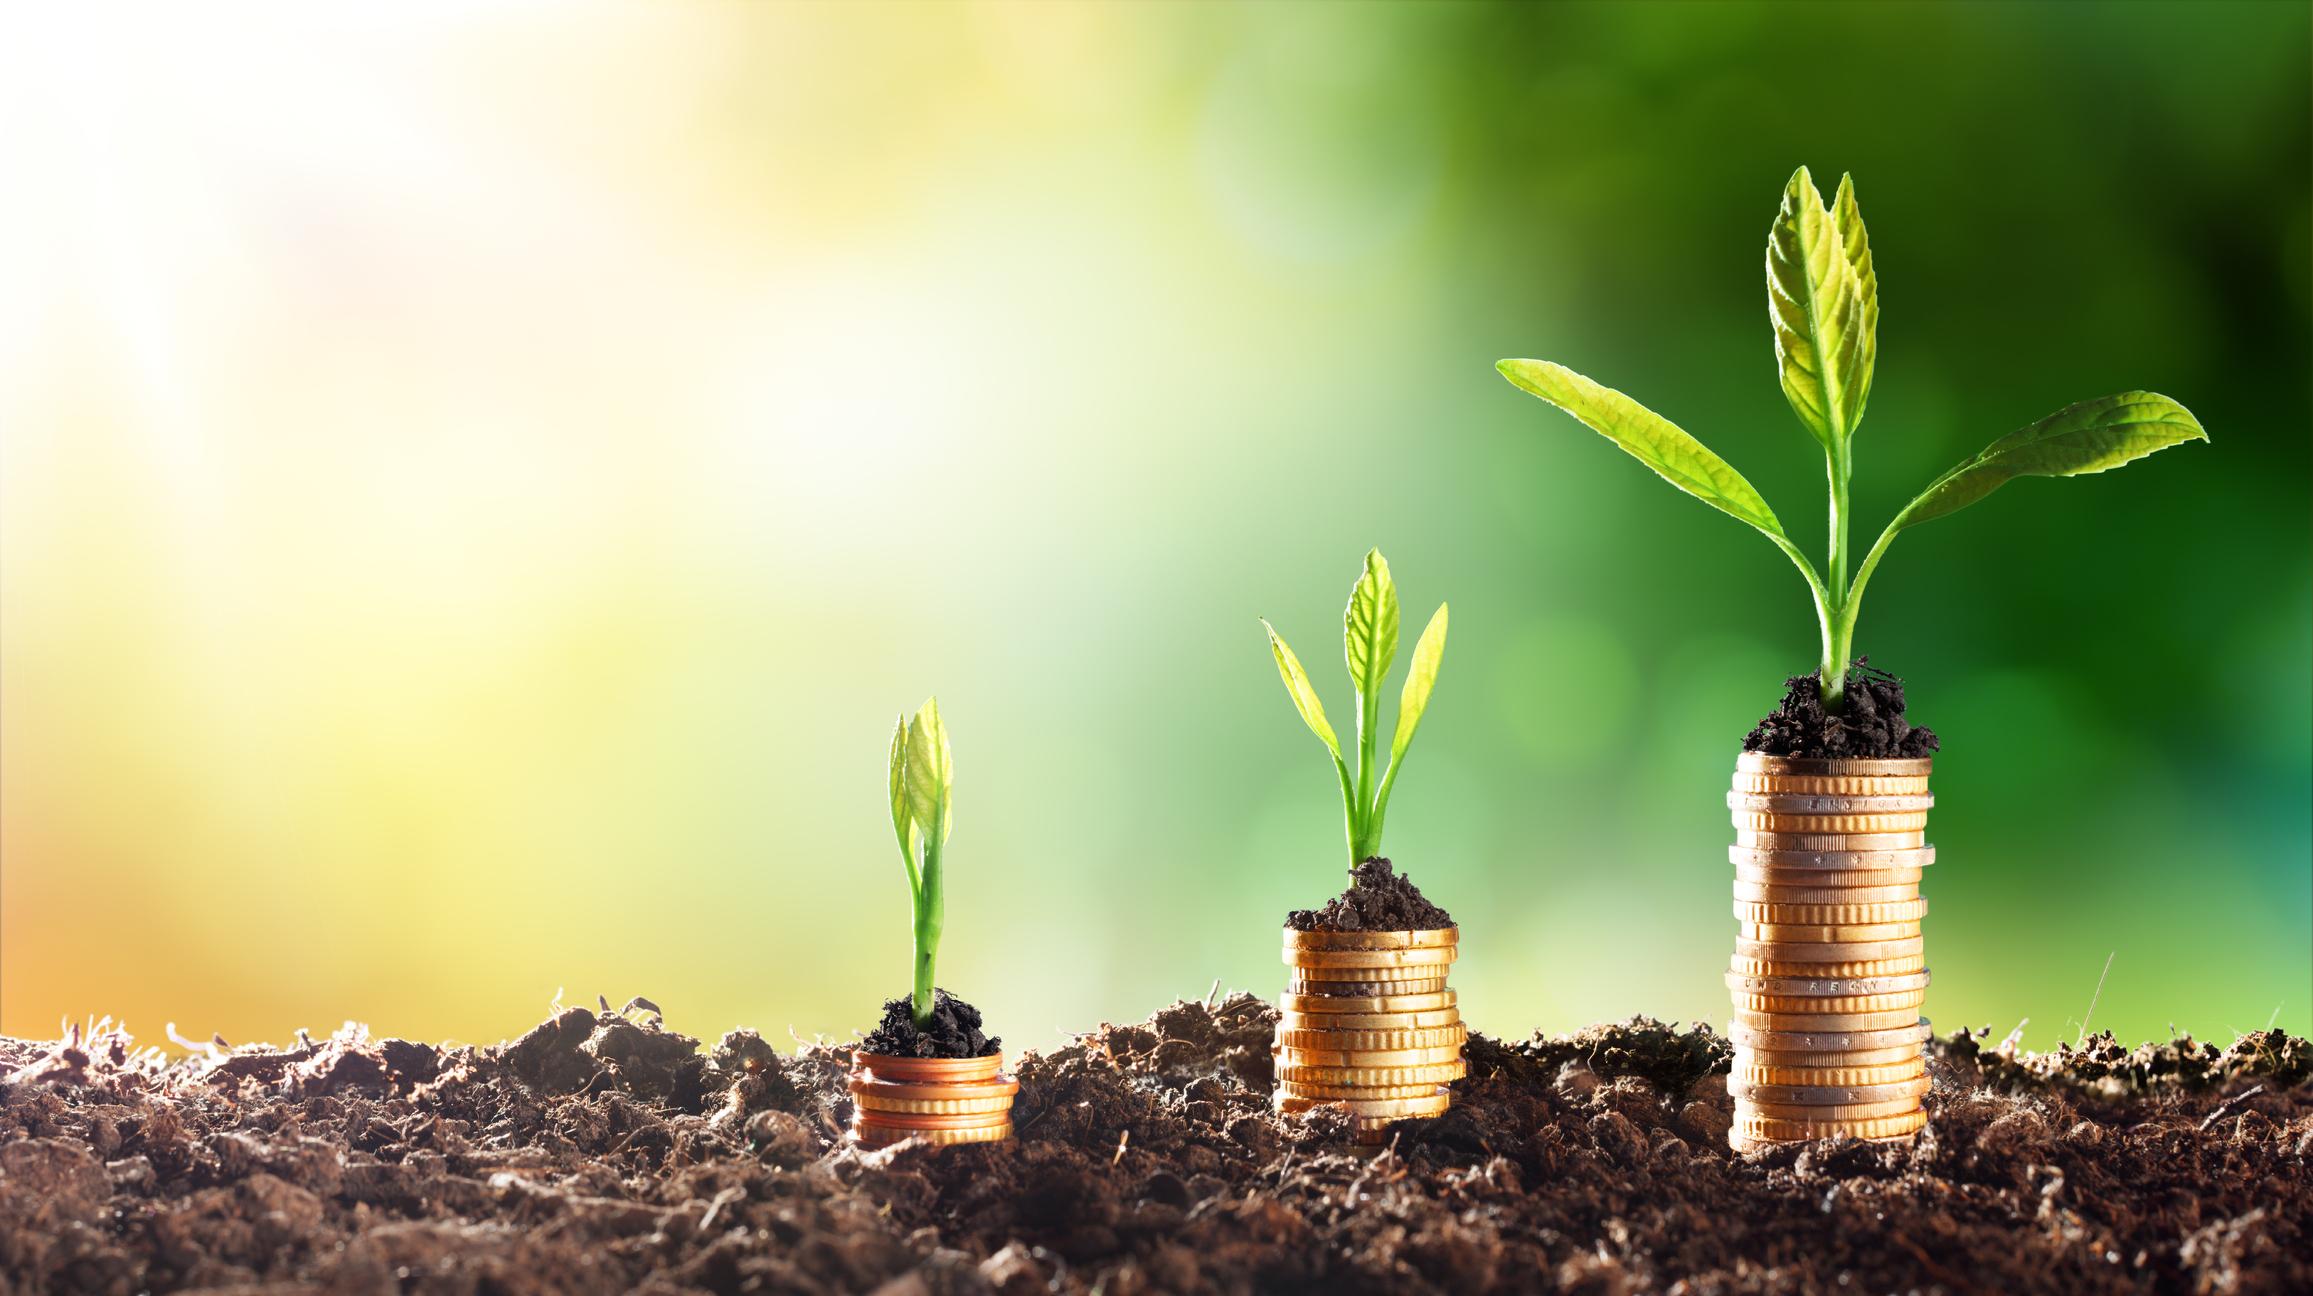 Growing seedlings on progressively higher stacks of coins.